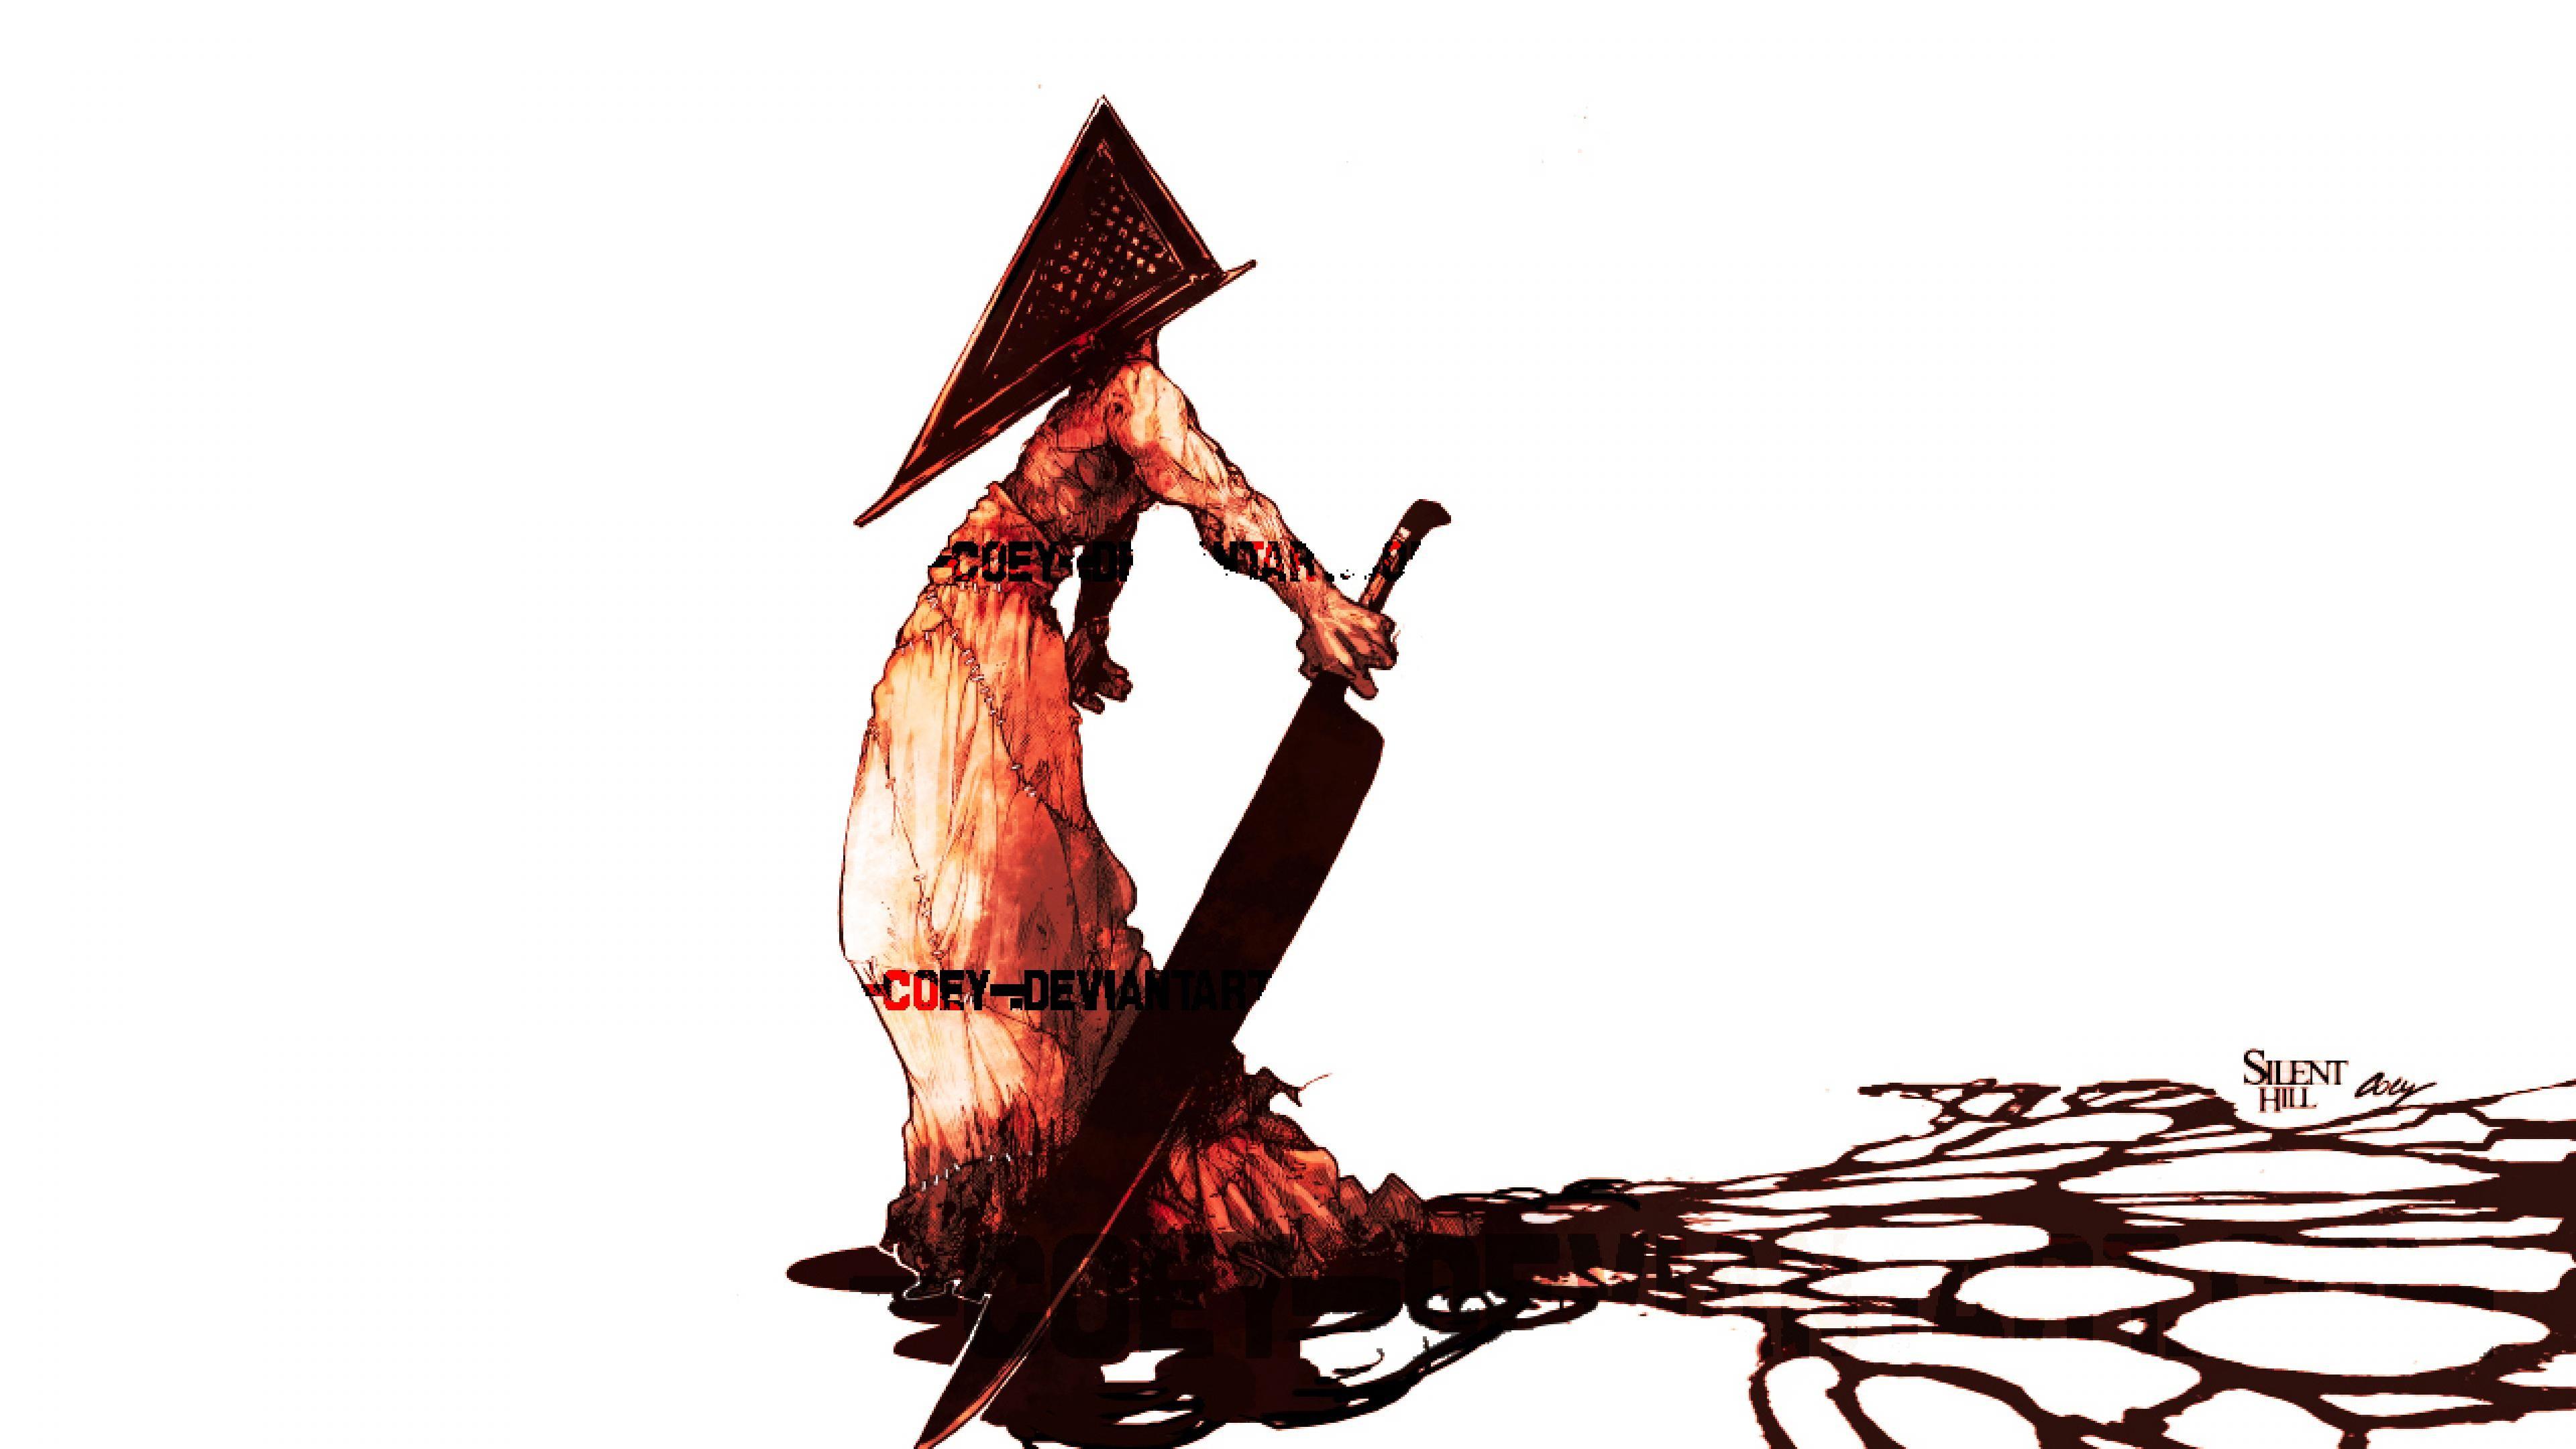 Silent Hill Pyramid Head Wallpaper – WallpaperSafari